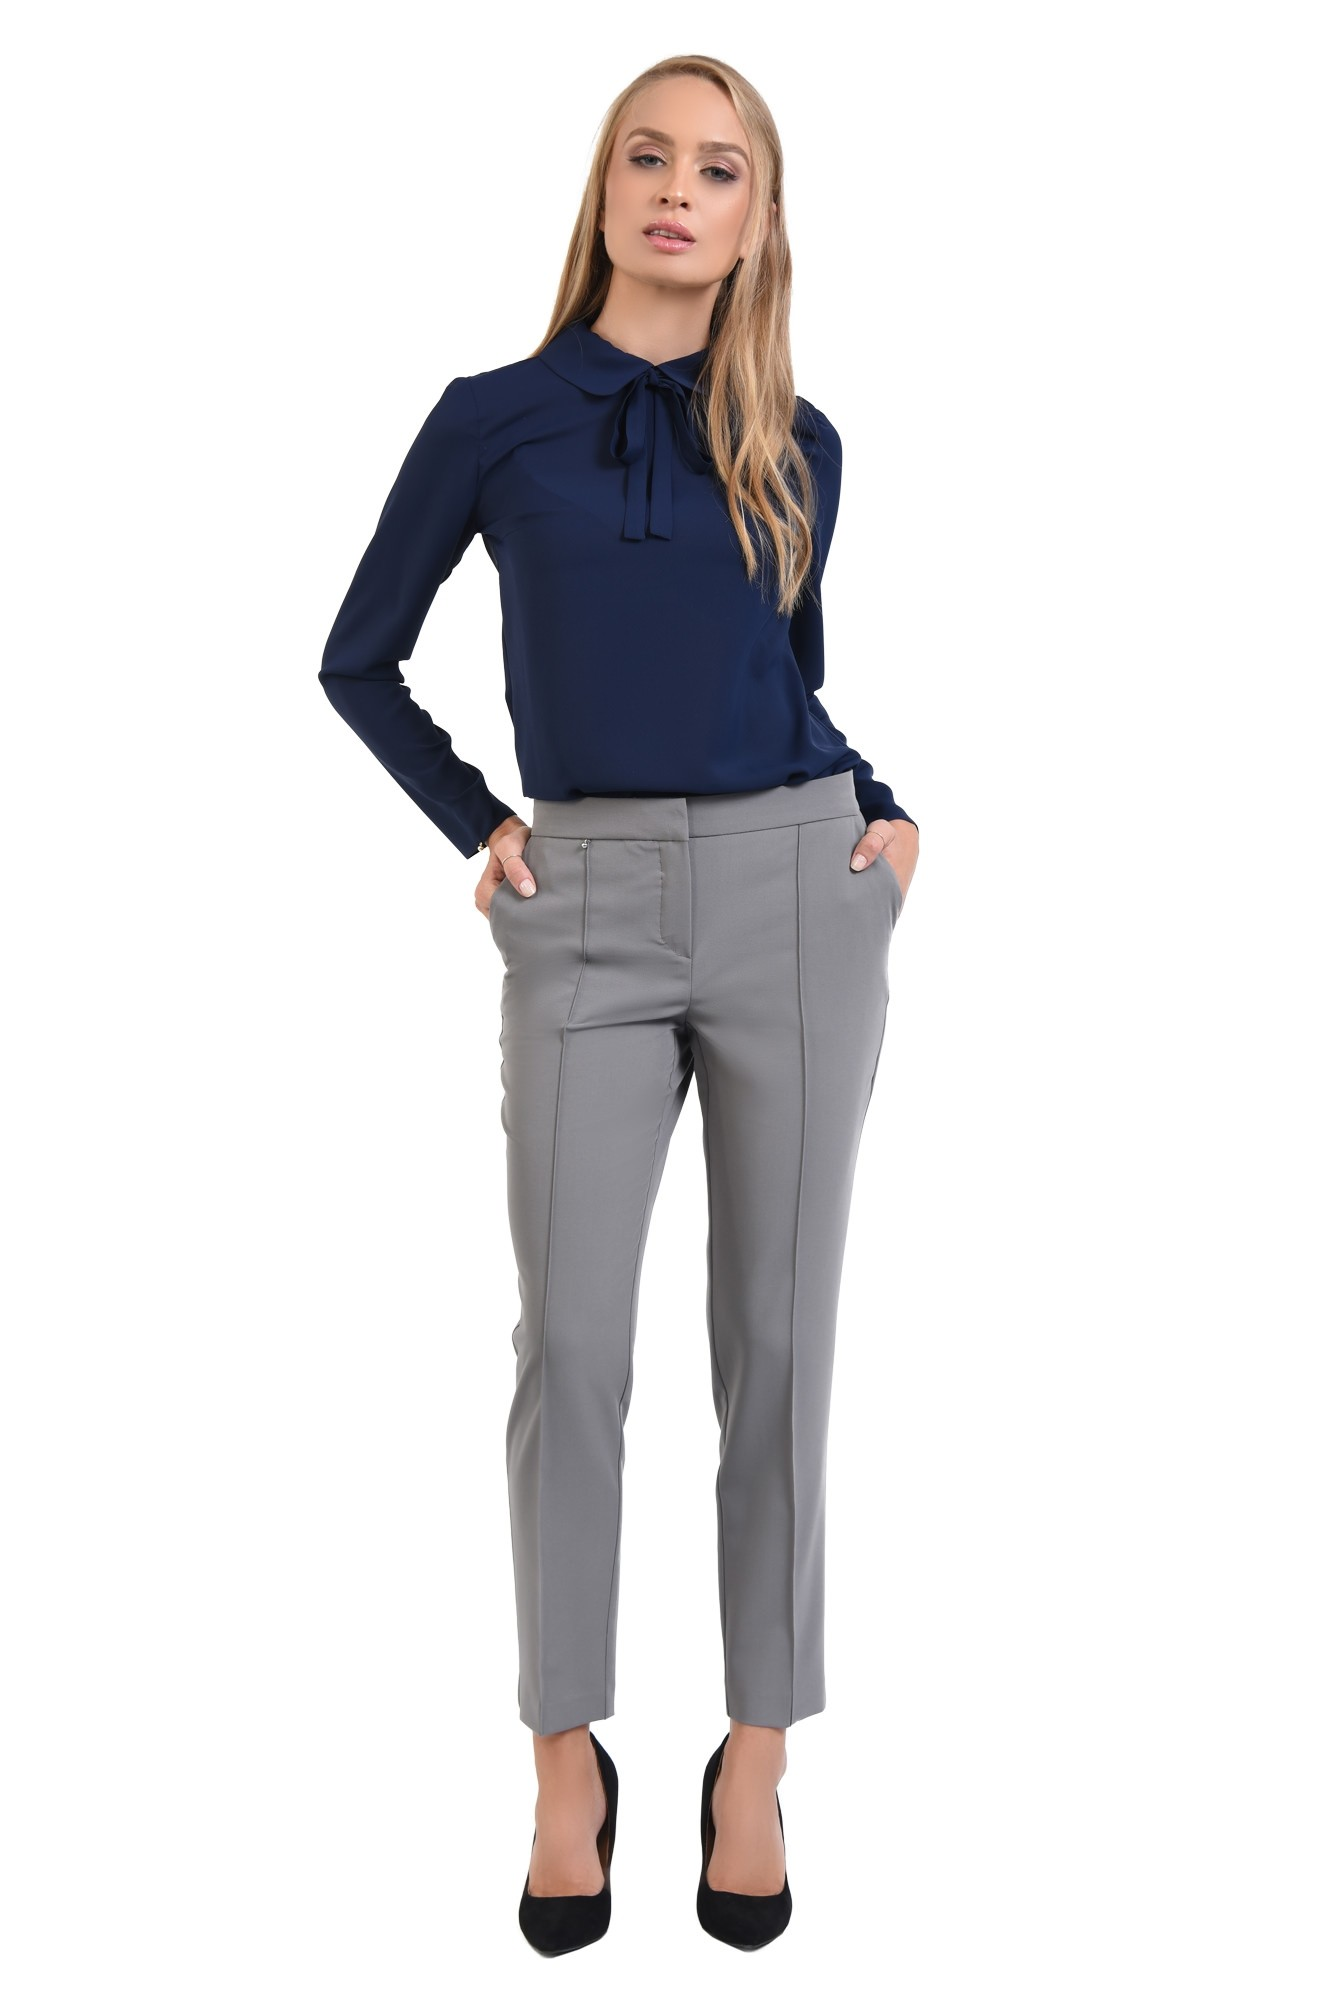 3 - 360 - bluza office, cu funda, guler rotunjit, bluza de birou, bleumarin